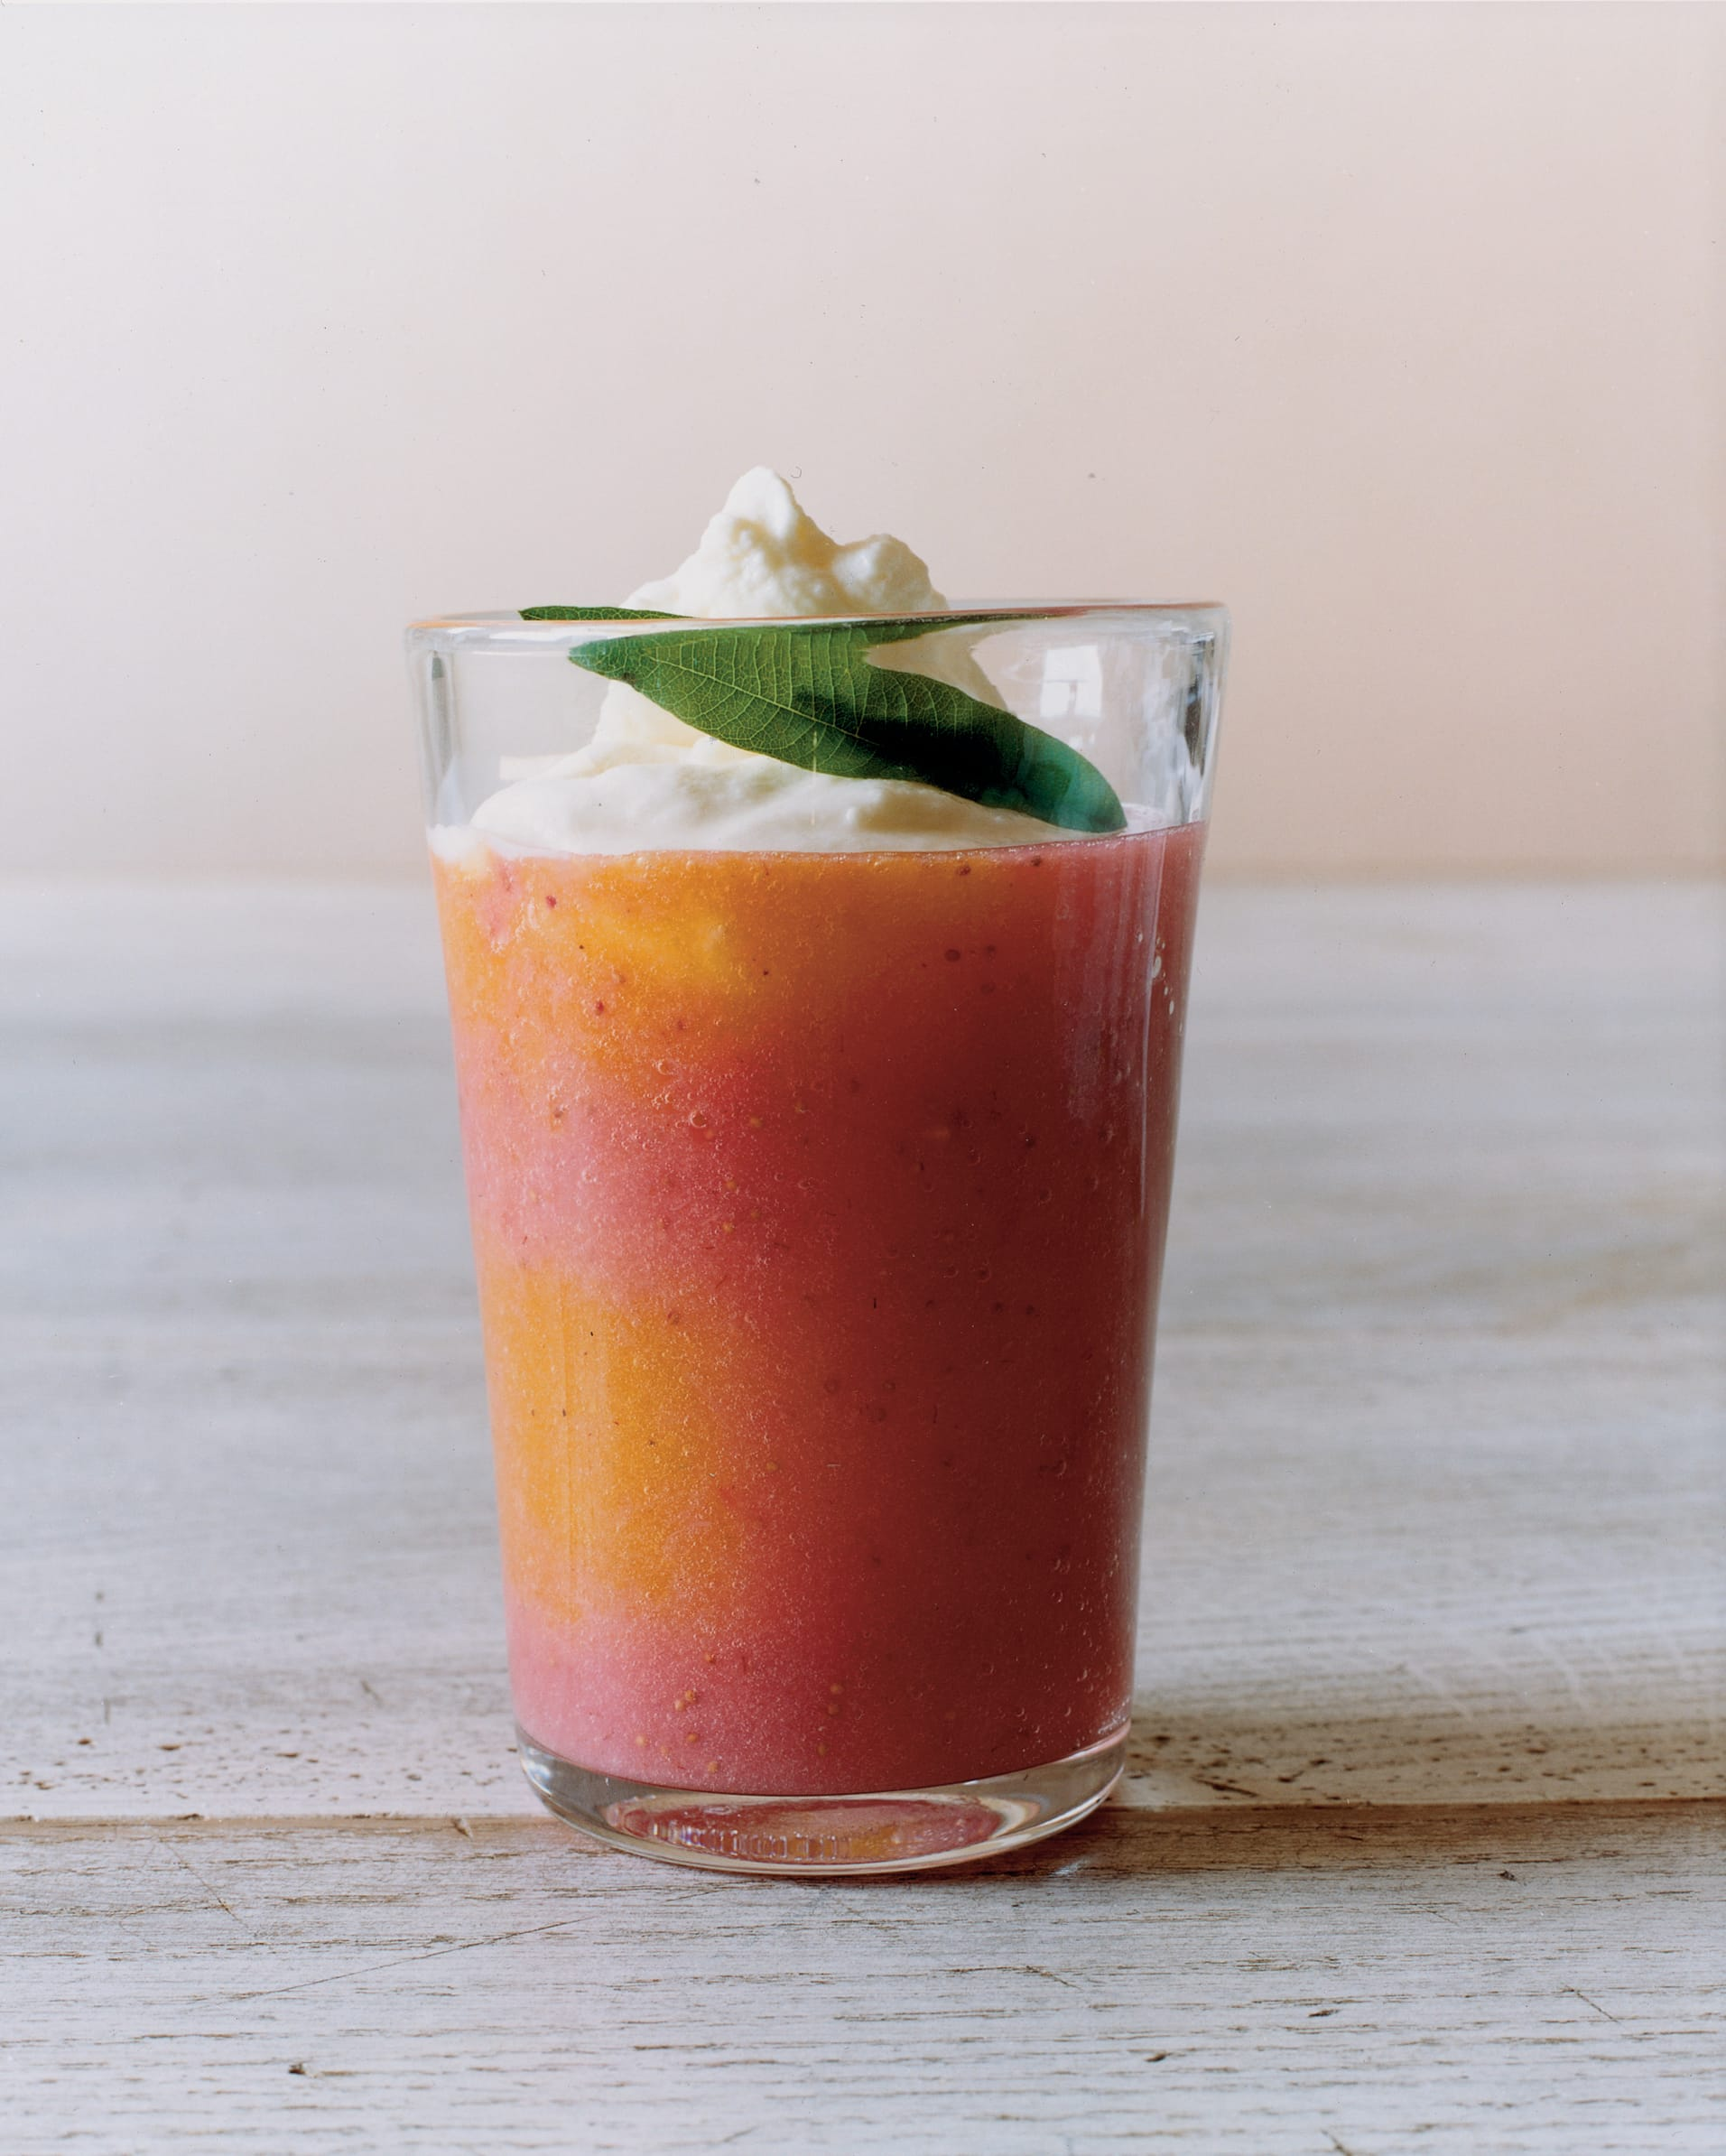 Aprikosen-Erdbeer-Smoothie mit Meringue-Rahm